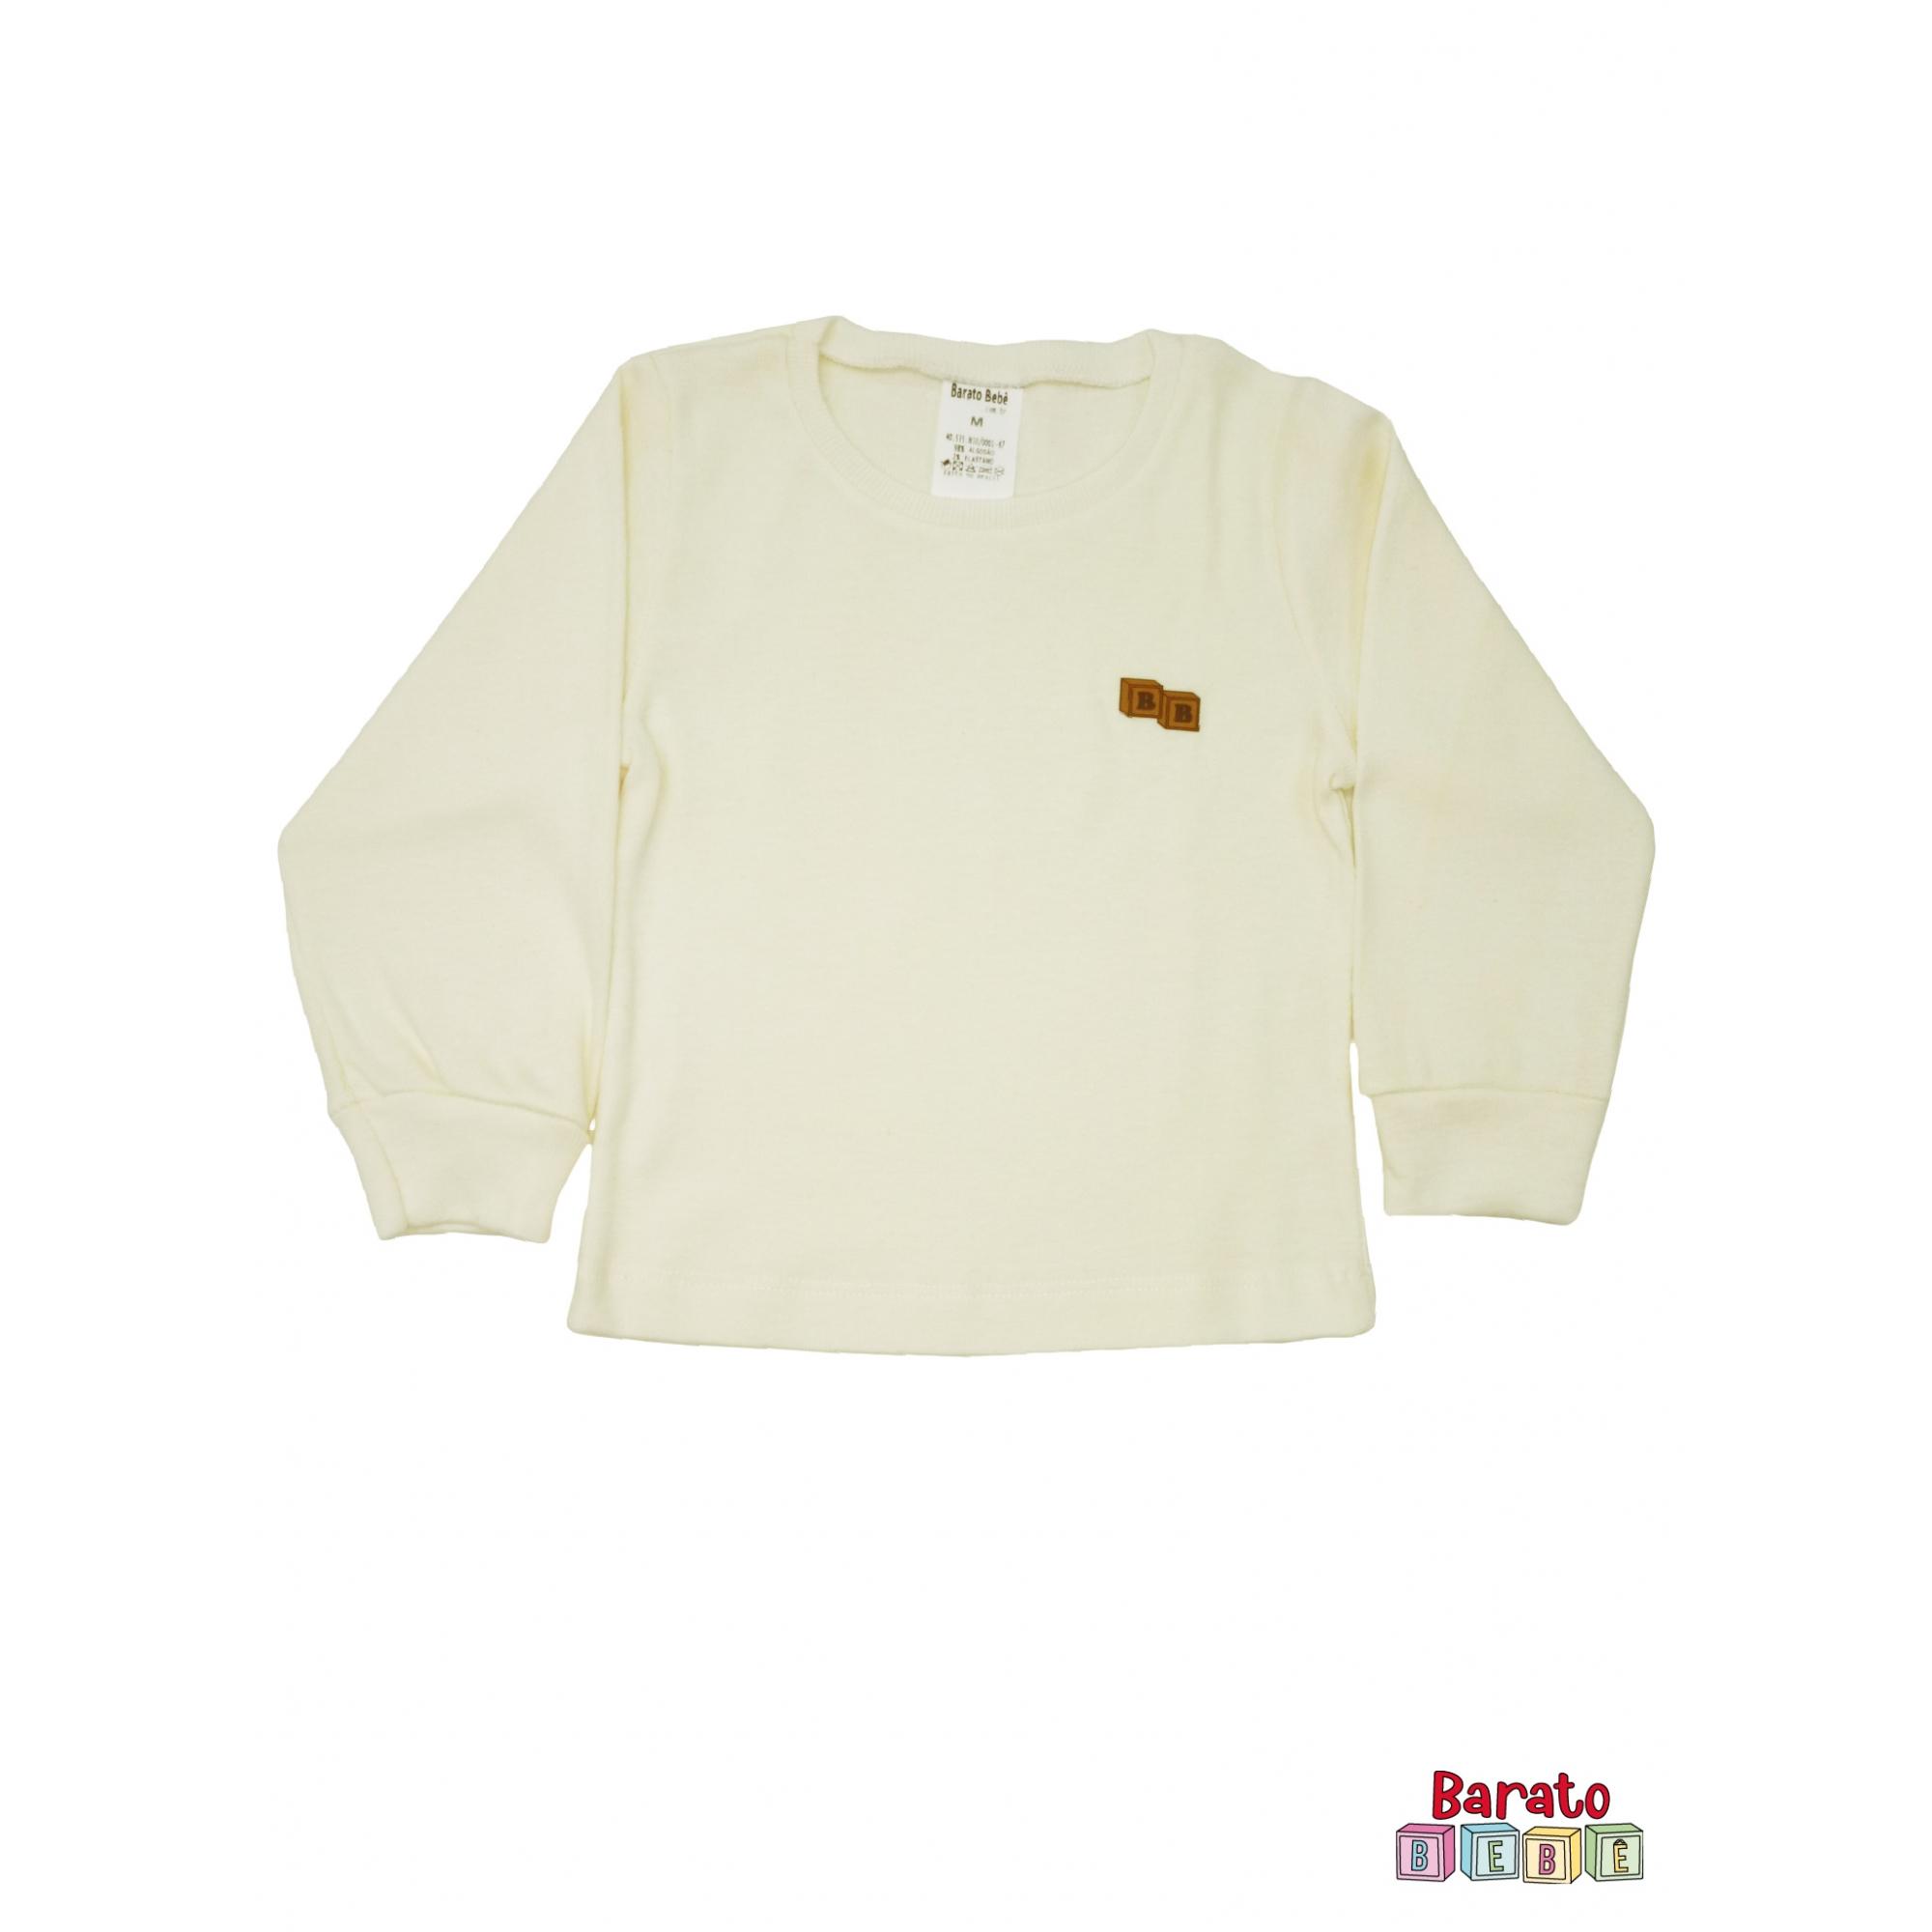 Conjunto Pijama Longo Bebê (P-M-G-GG)- Barato Bebê - Off White